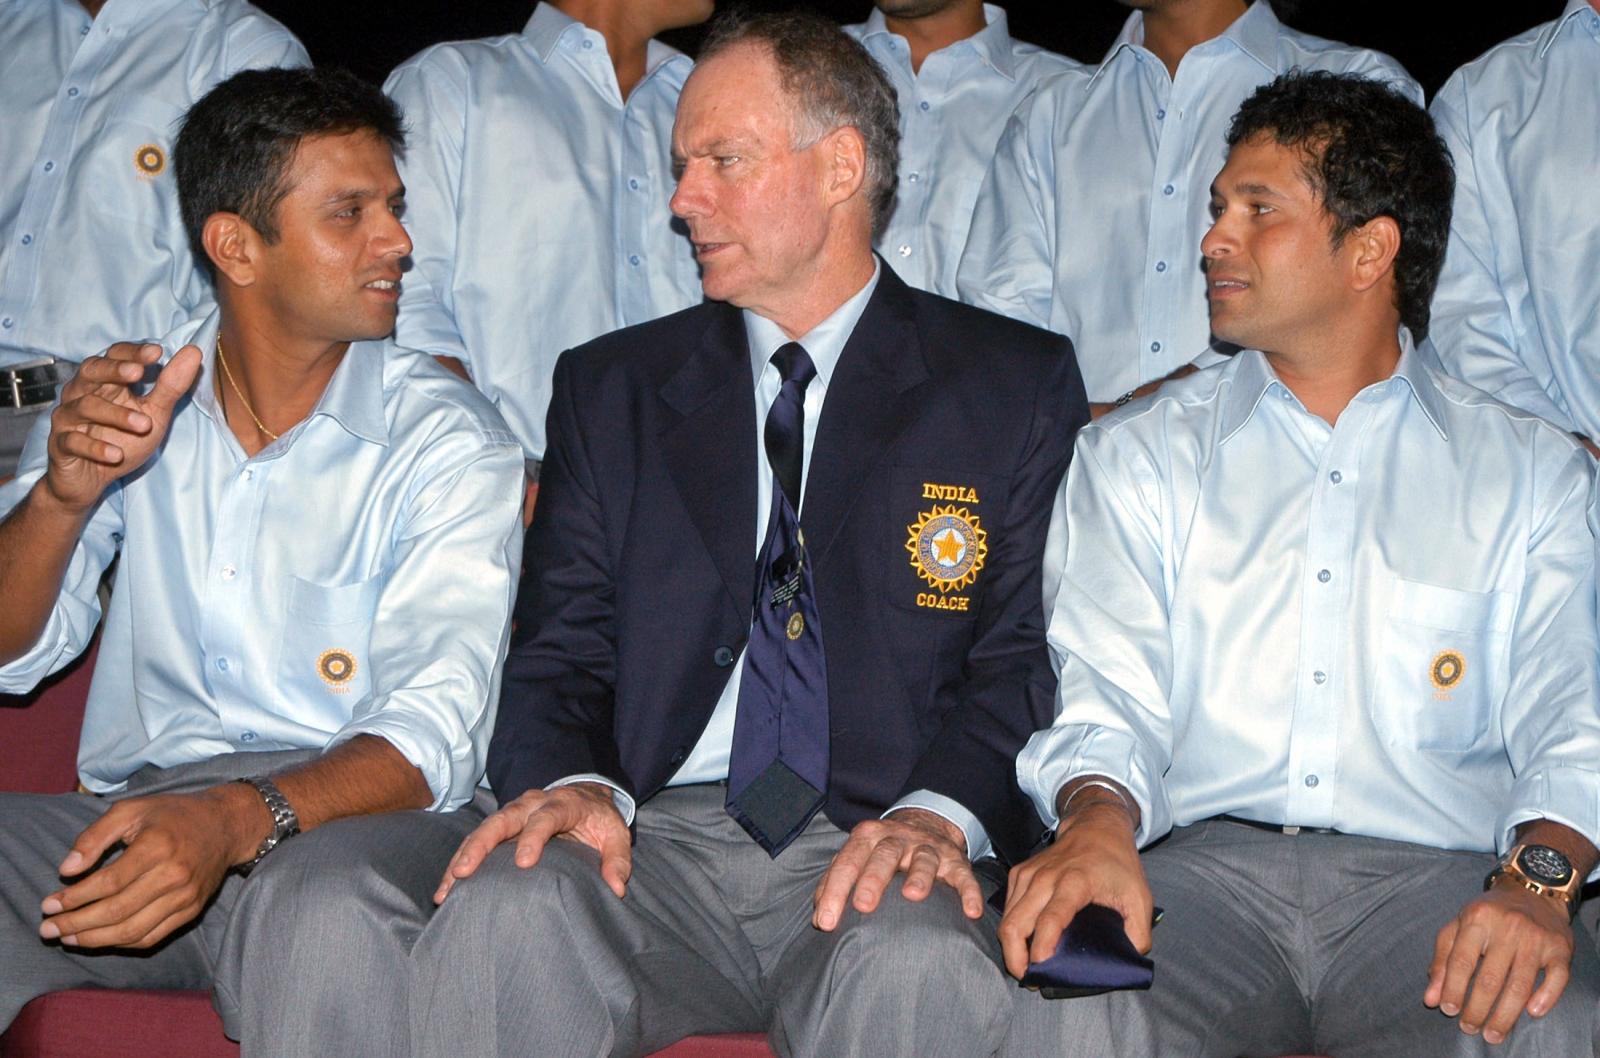 Rahul Dravid-Greg Chappell-Sachin Tendulkar